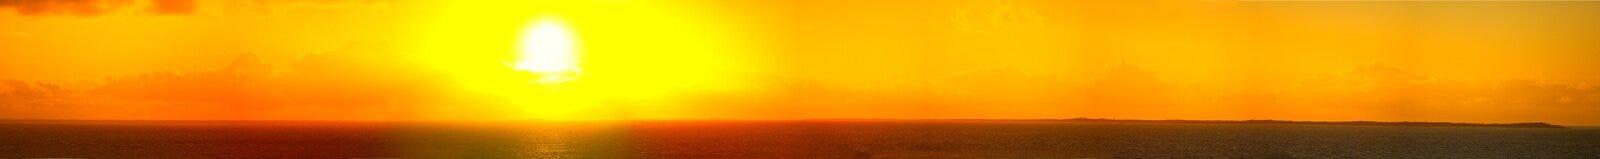 180-Grad-Panorama von Bahamas am Sonnenaufgang Stockbild